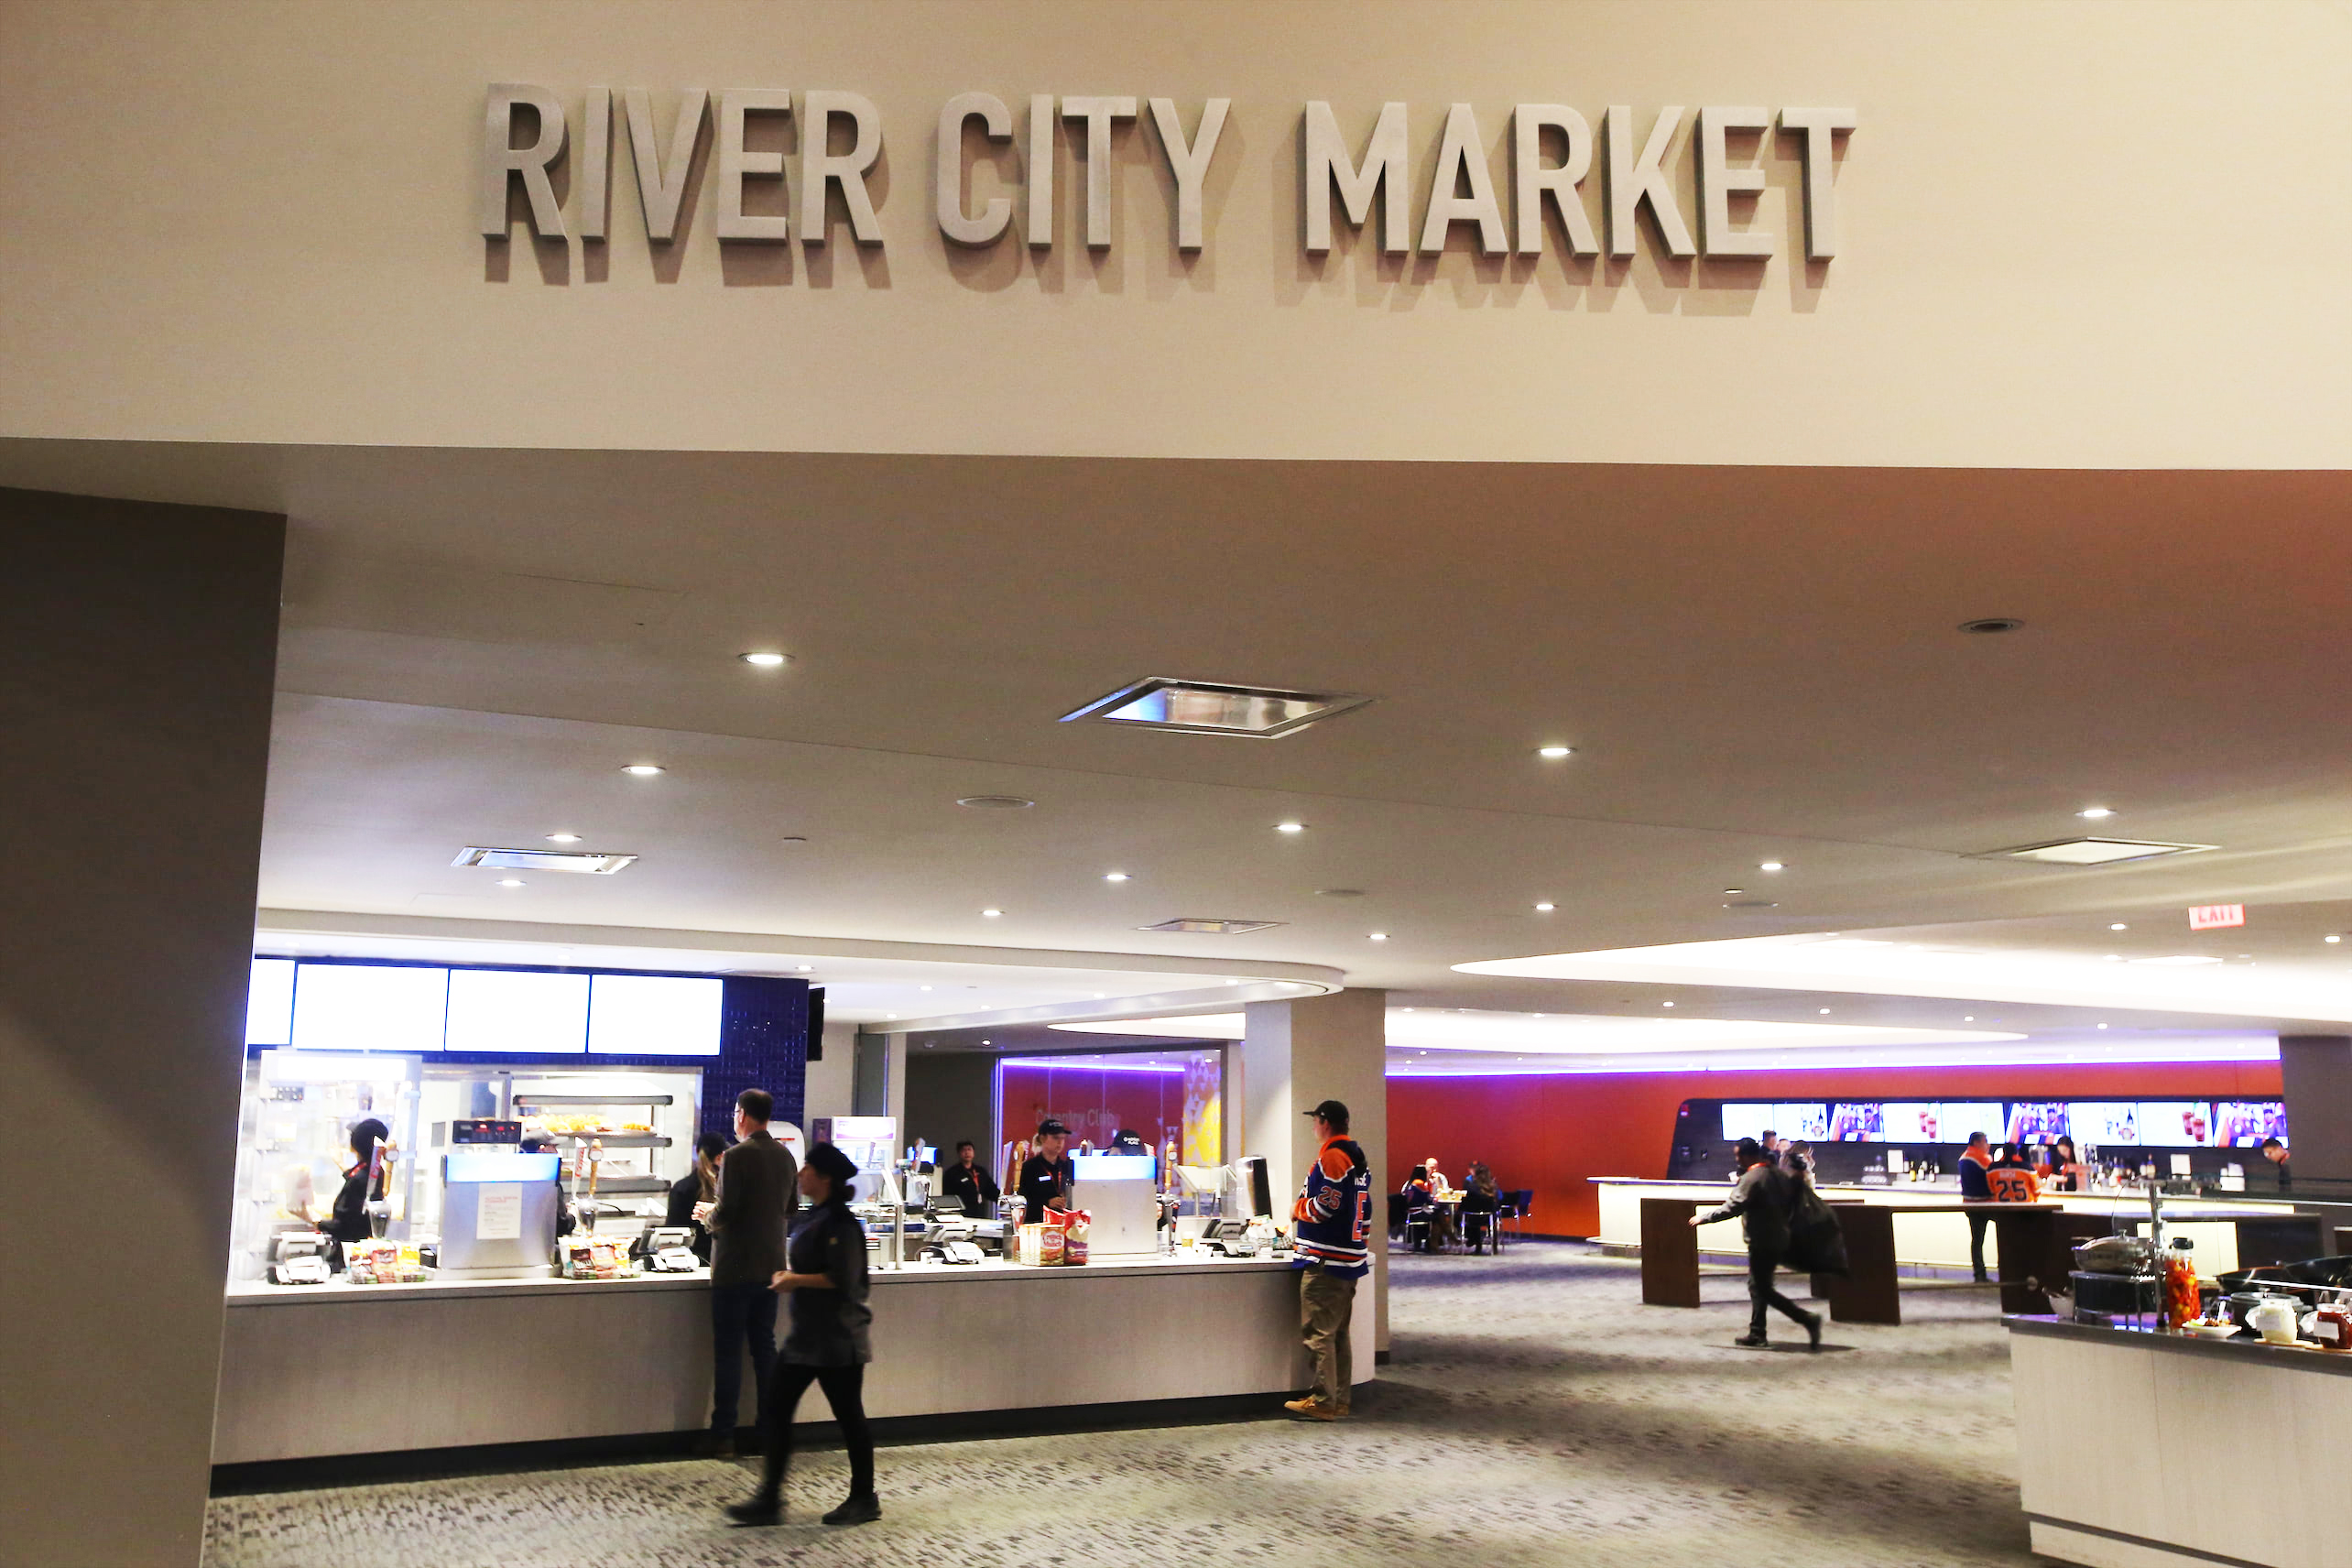 River City Market